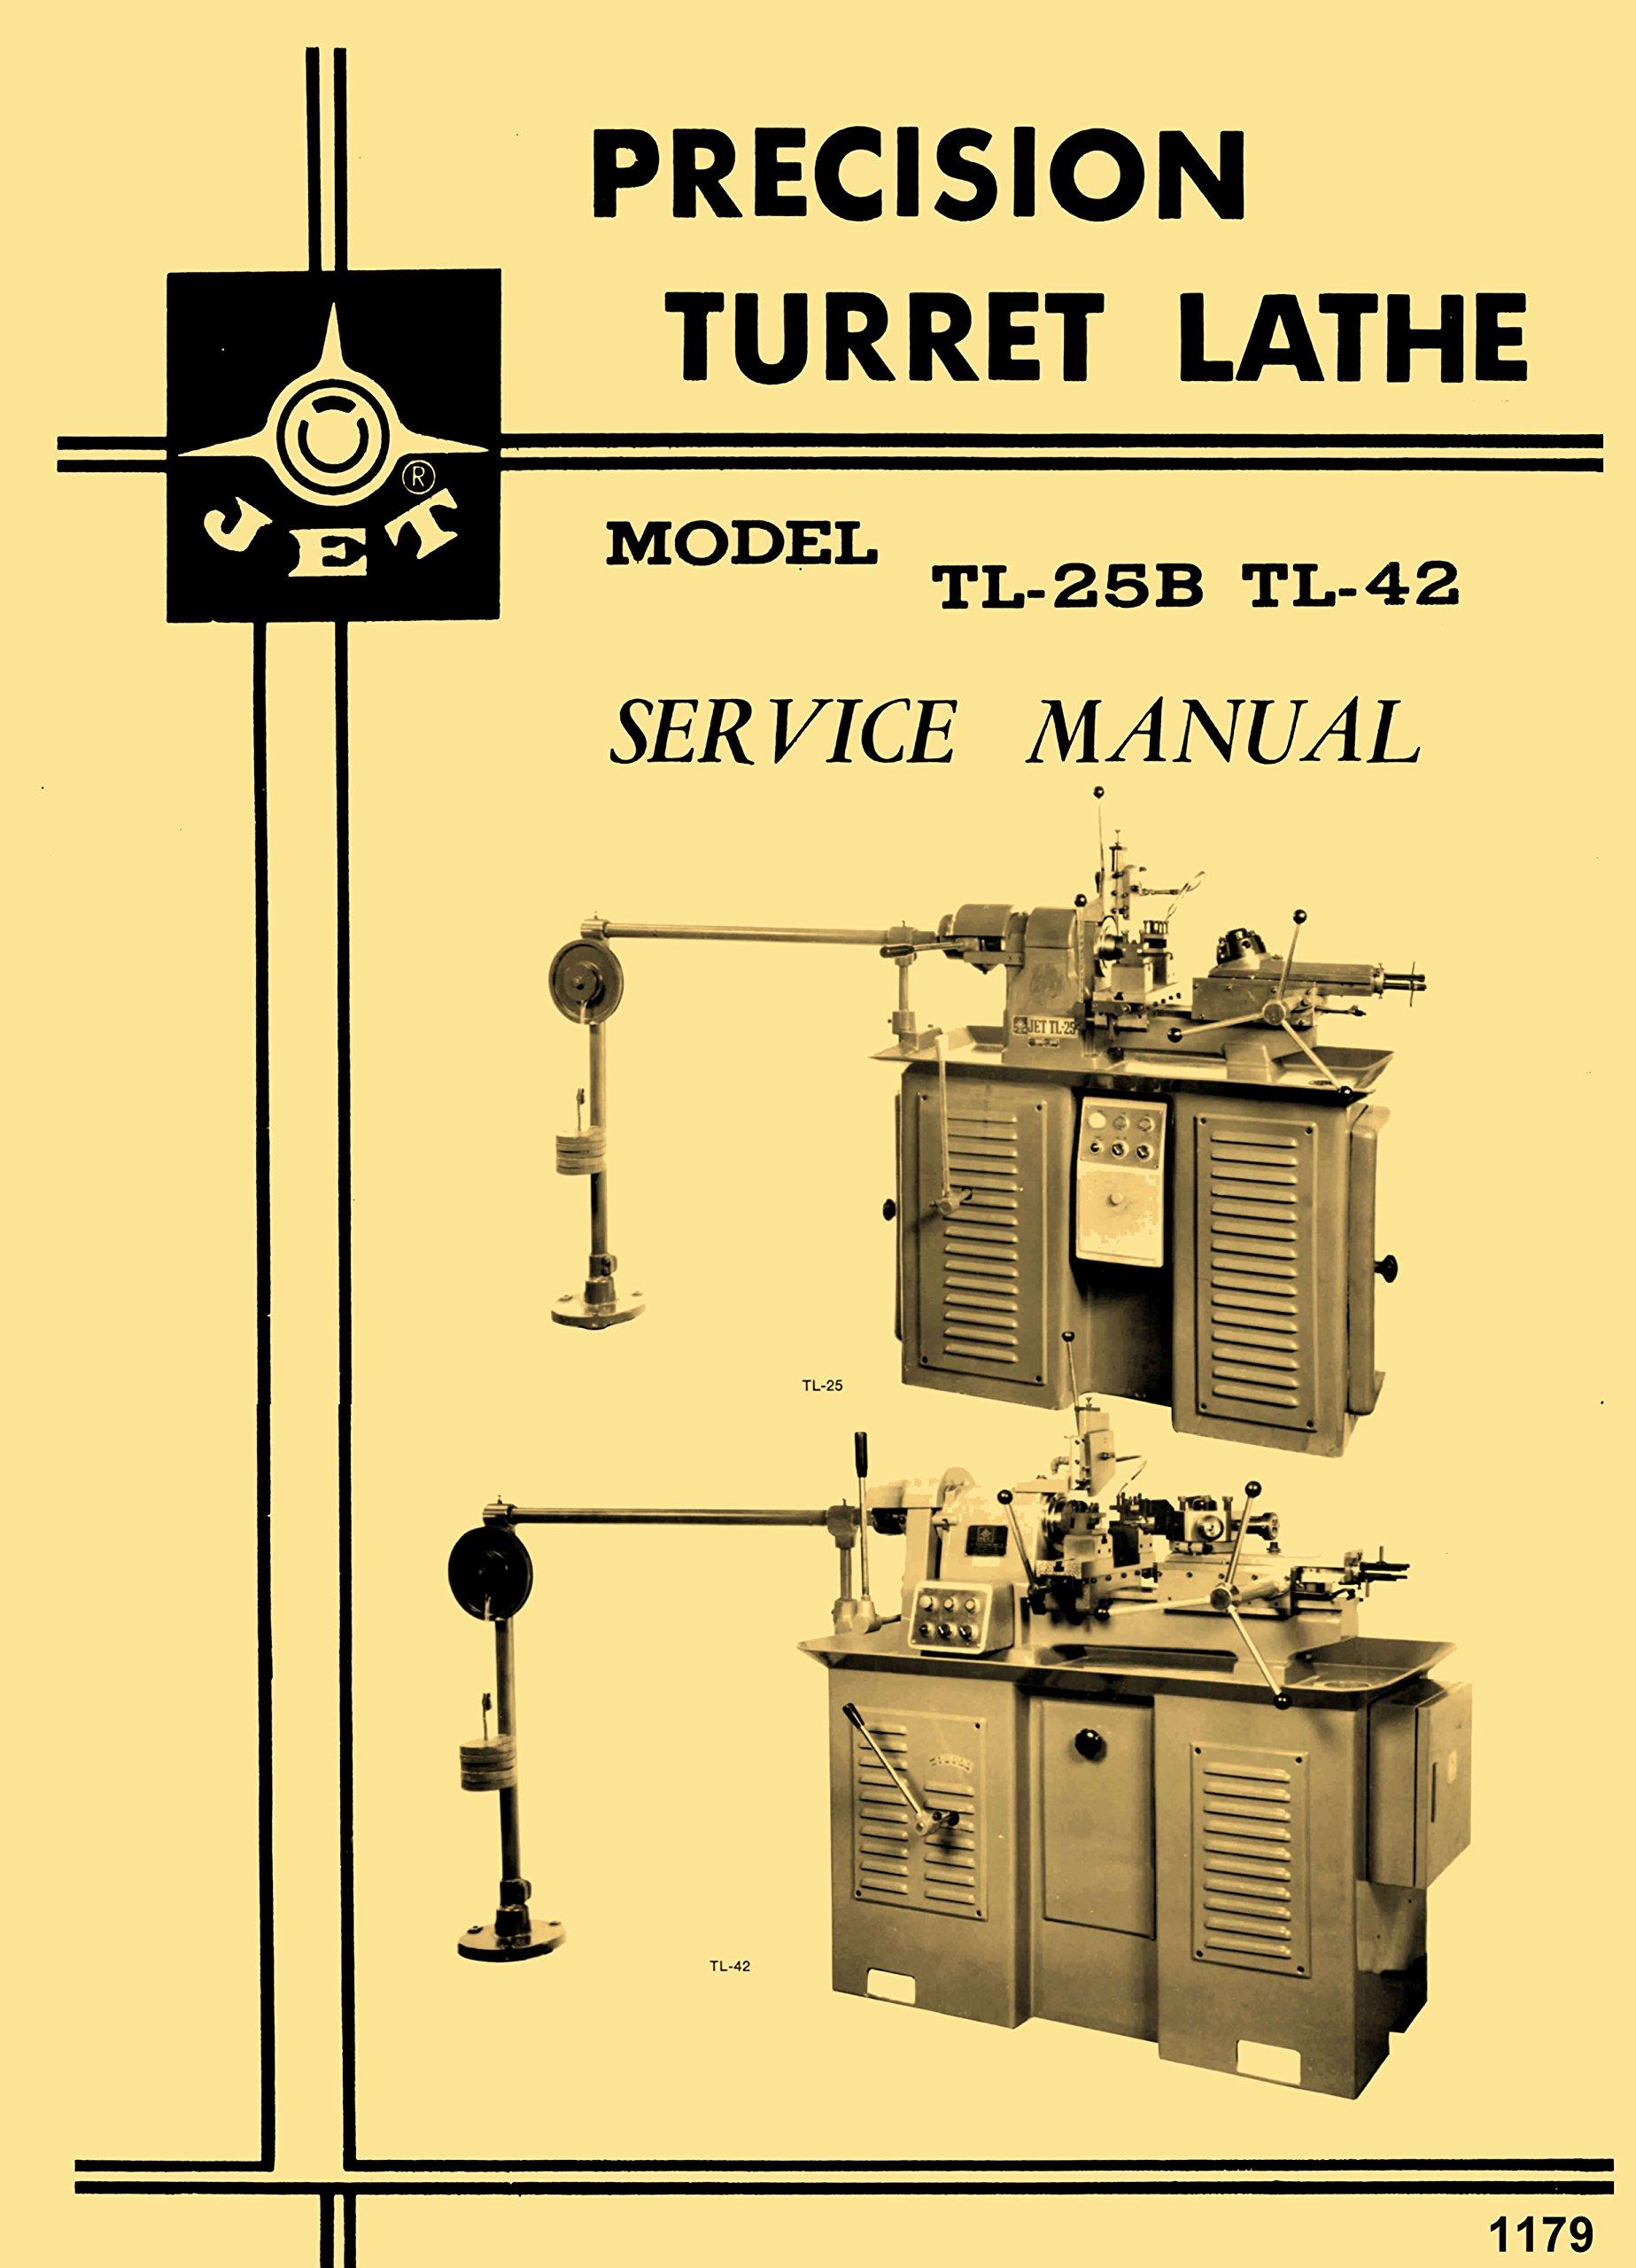 JET, Enco, MSC, Super-Precision, Asian Turret Lathe LHT, TL, 92040  Instructions & Parts Manual: Misc.: Amazon.com: Books